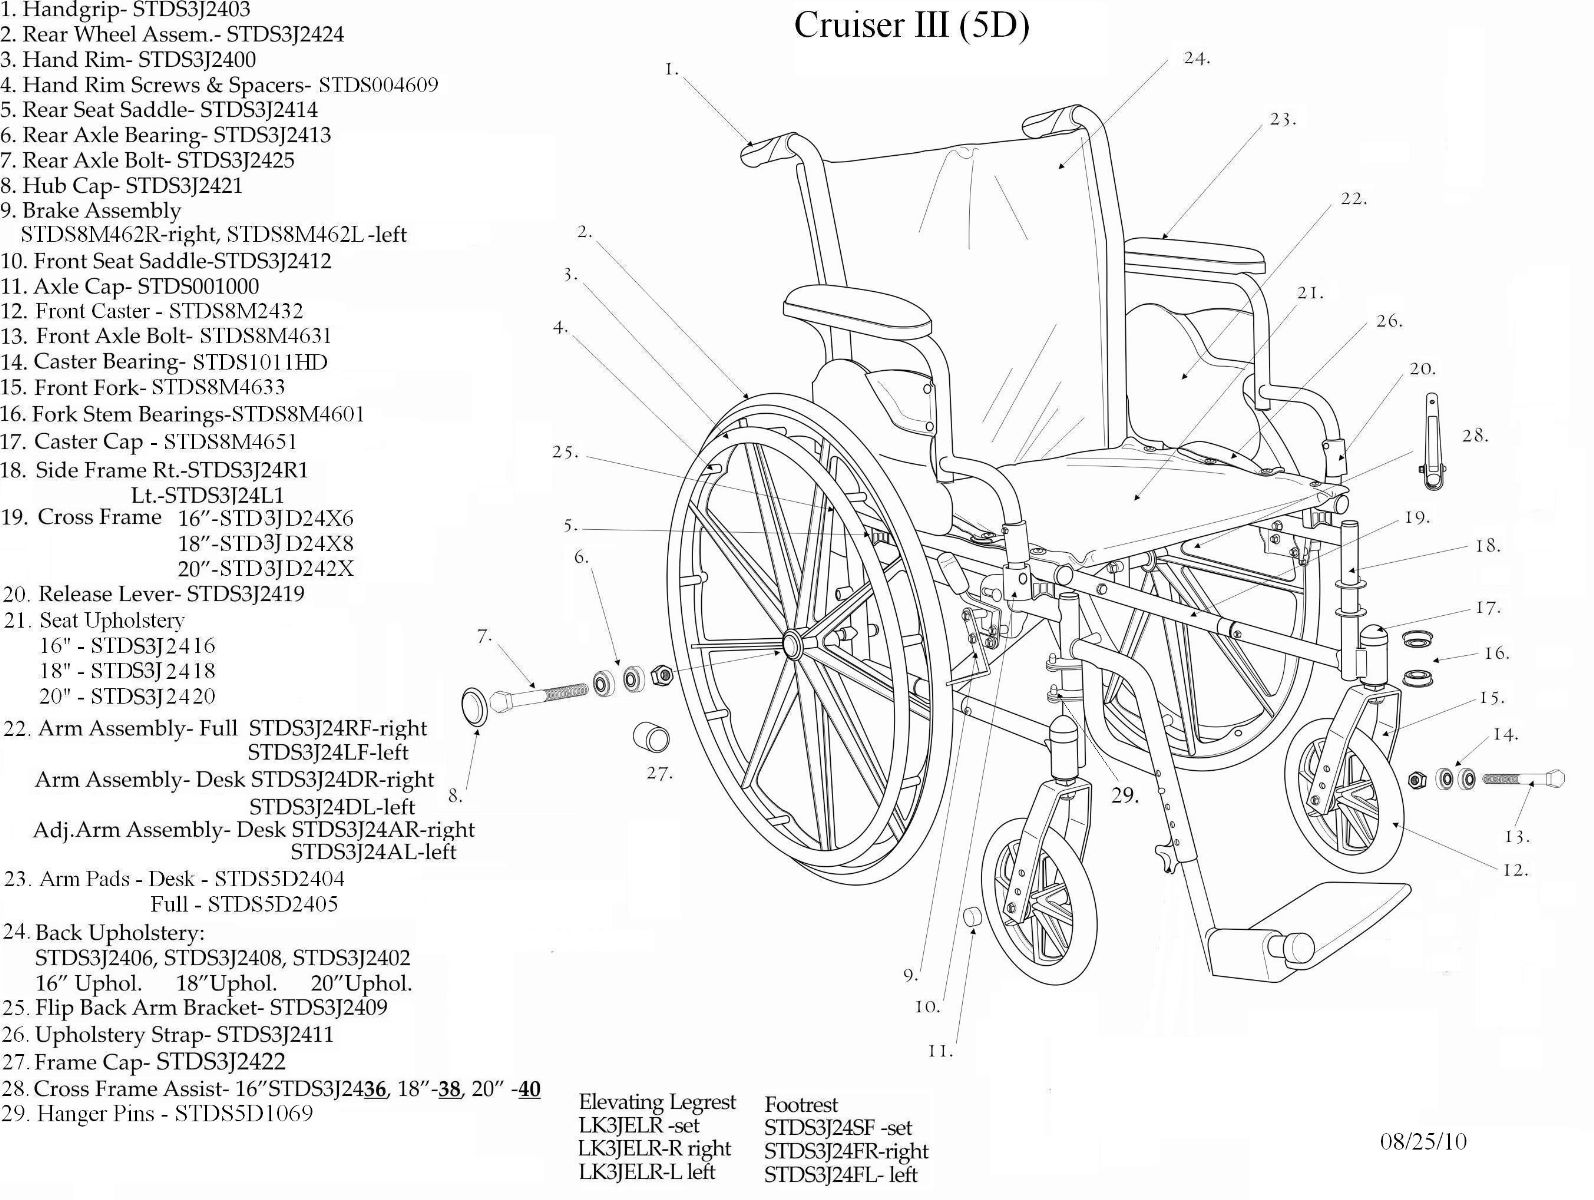 Land Rover Defender 200tdi 110 Wiring Diagram. Rover. Auto